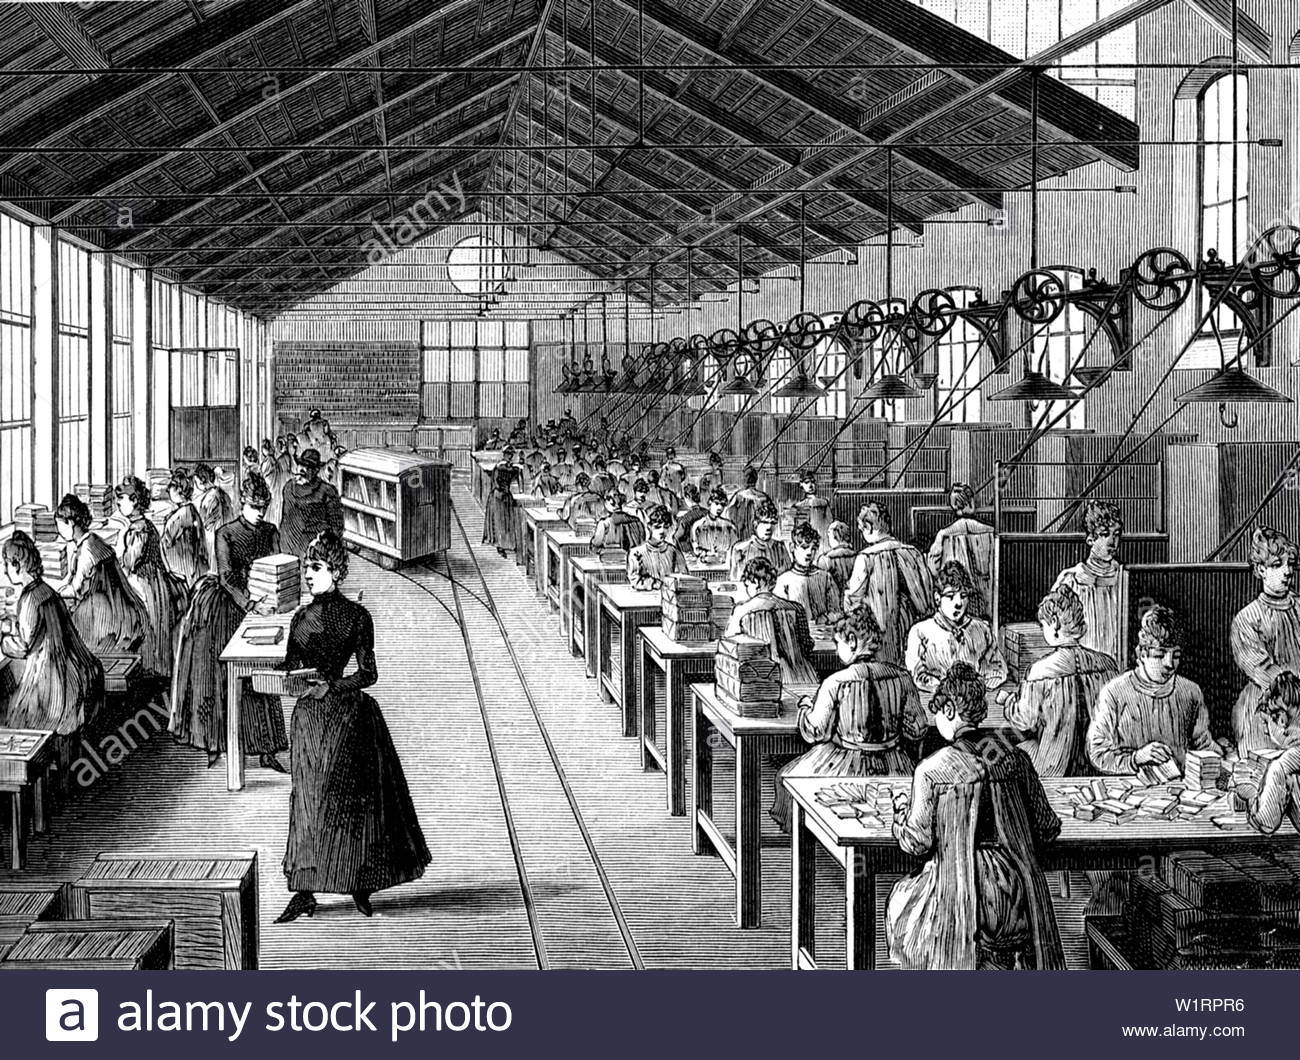 Notizie oltre la storia... Safety-matches-factory-in-1889-W1RPR6